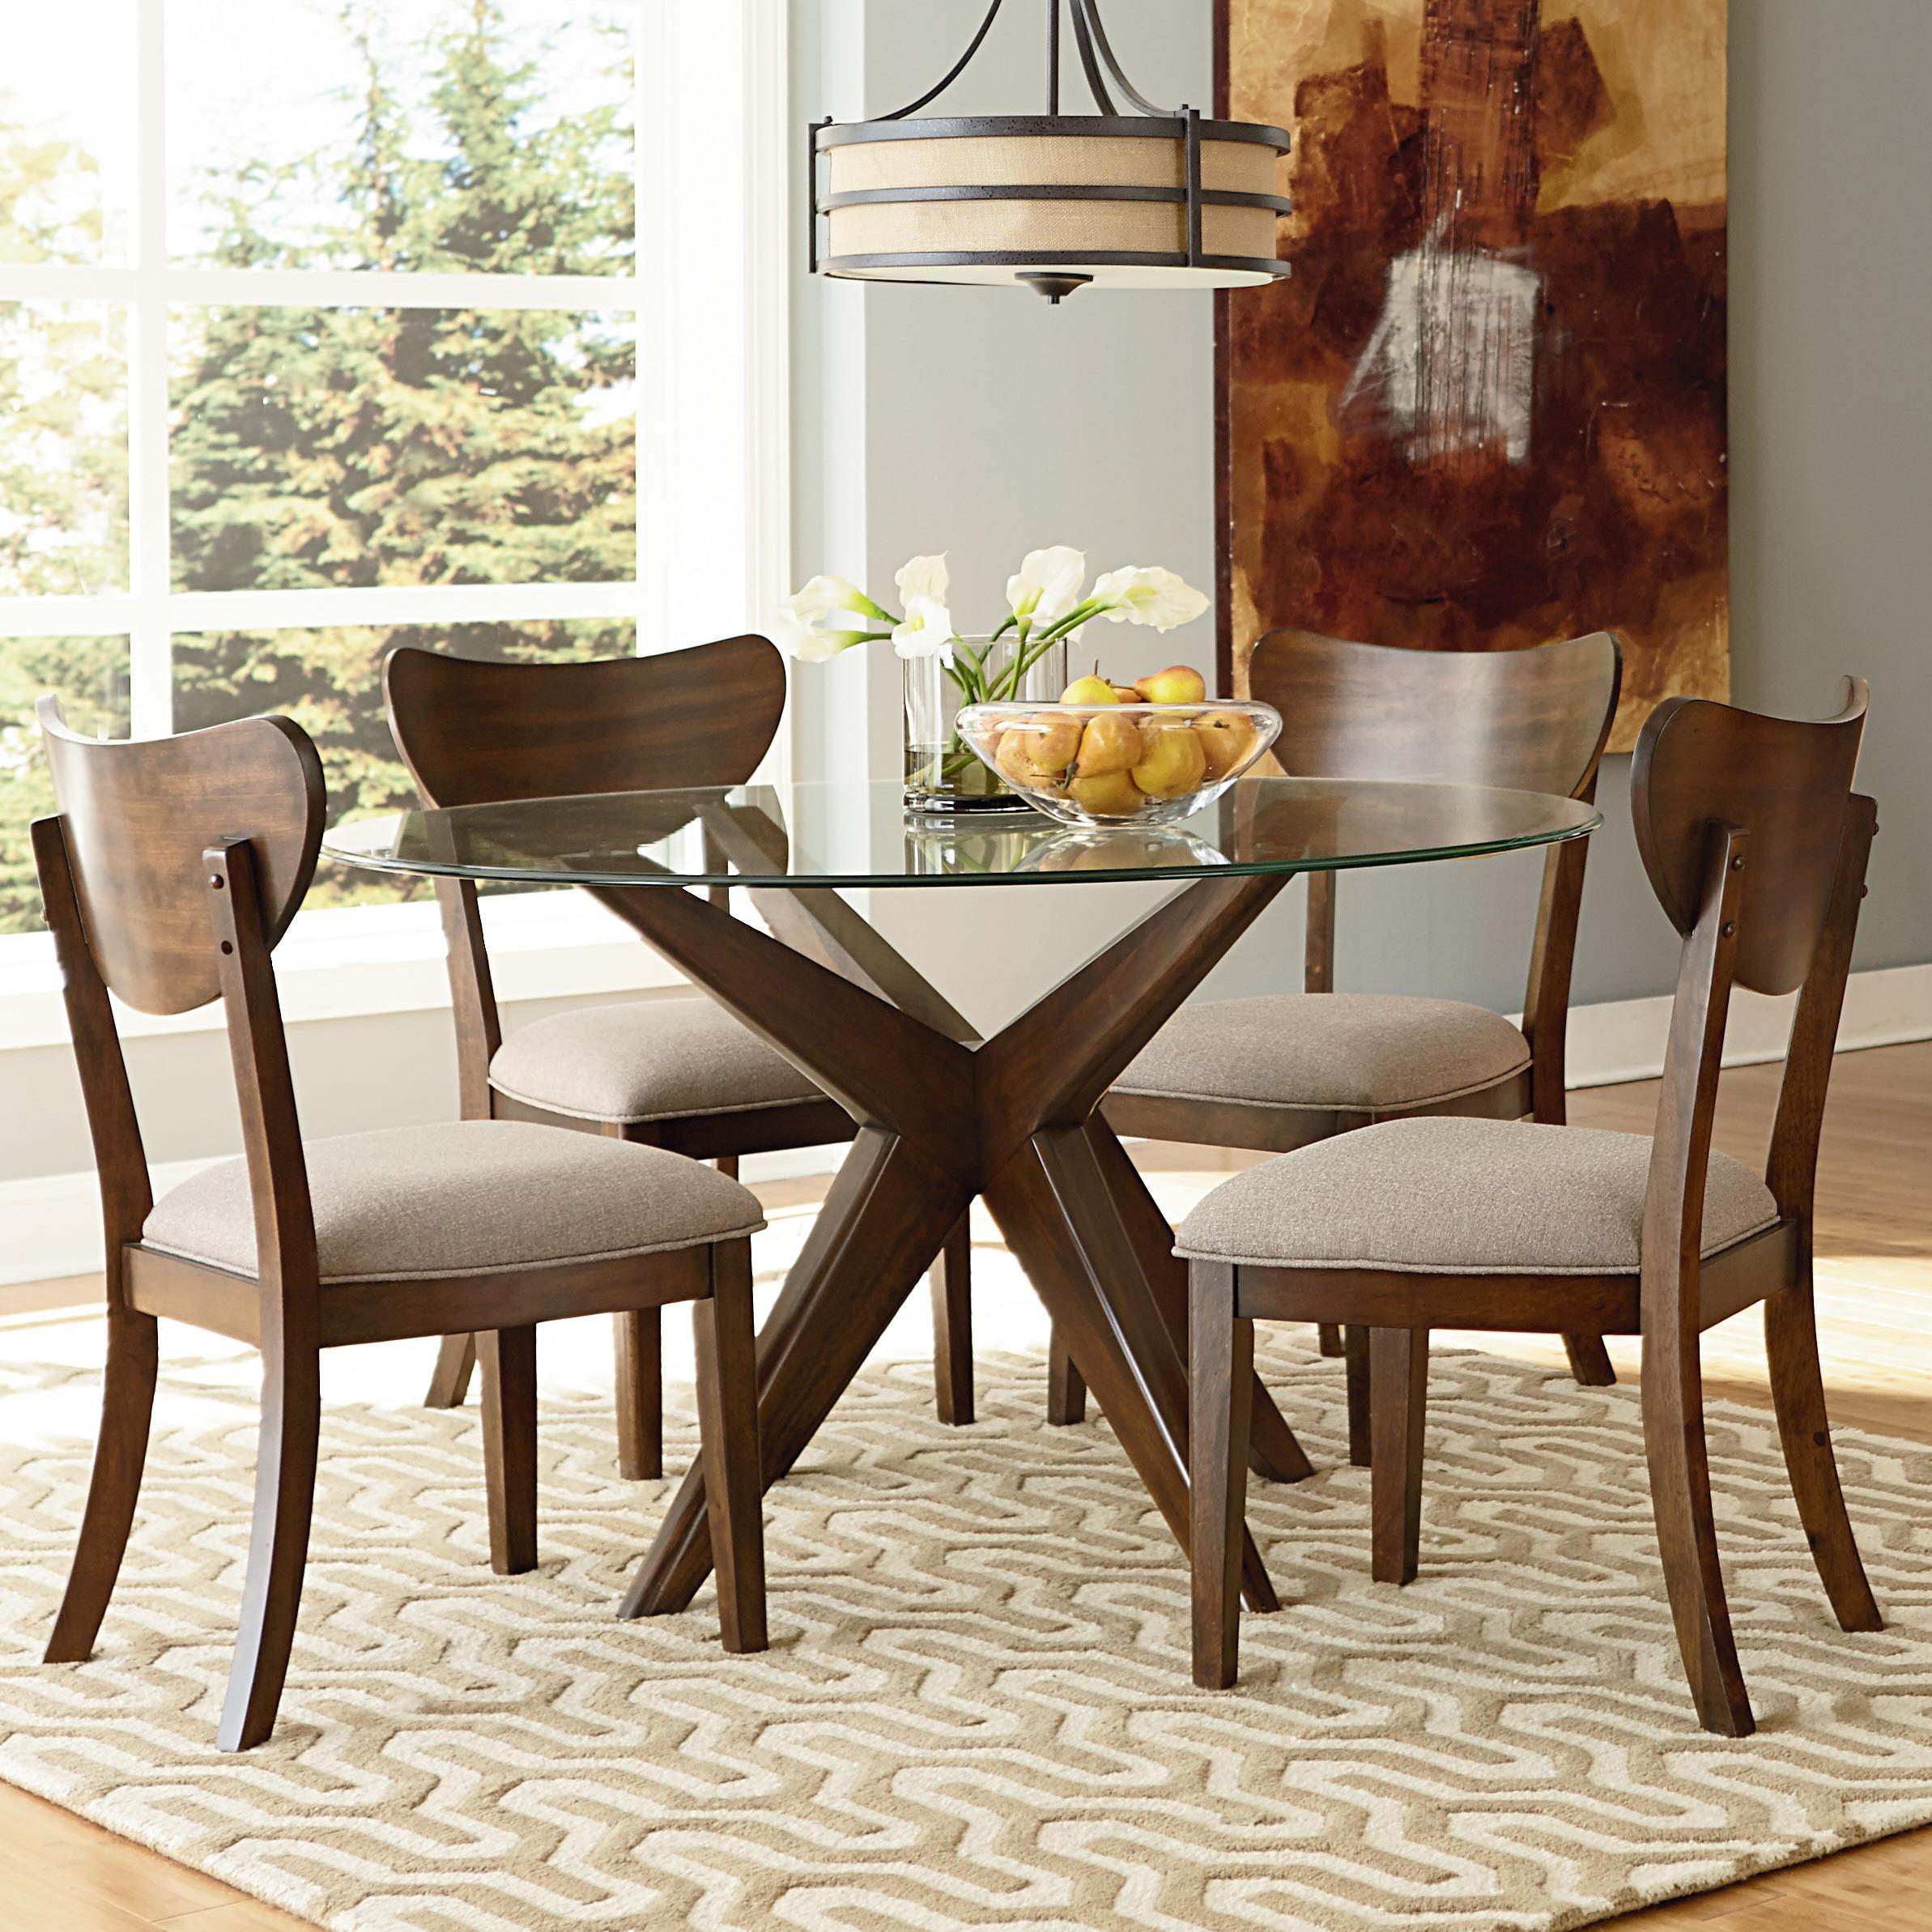 "Standard Furniture Roxbury 48"" Round Glass Table & Chair Set - Item Number: 16206+10021048+4x16204"